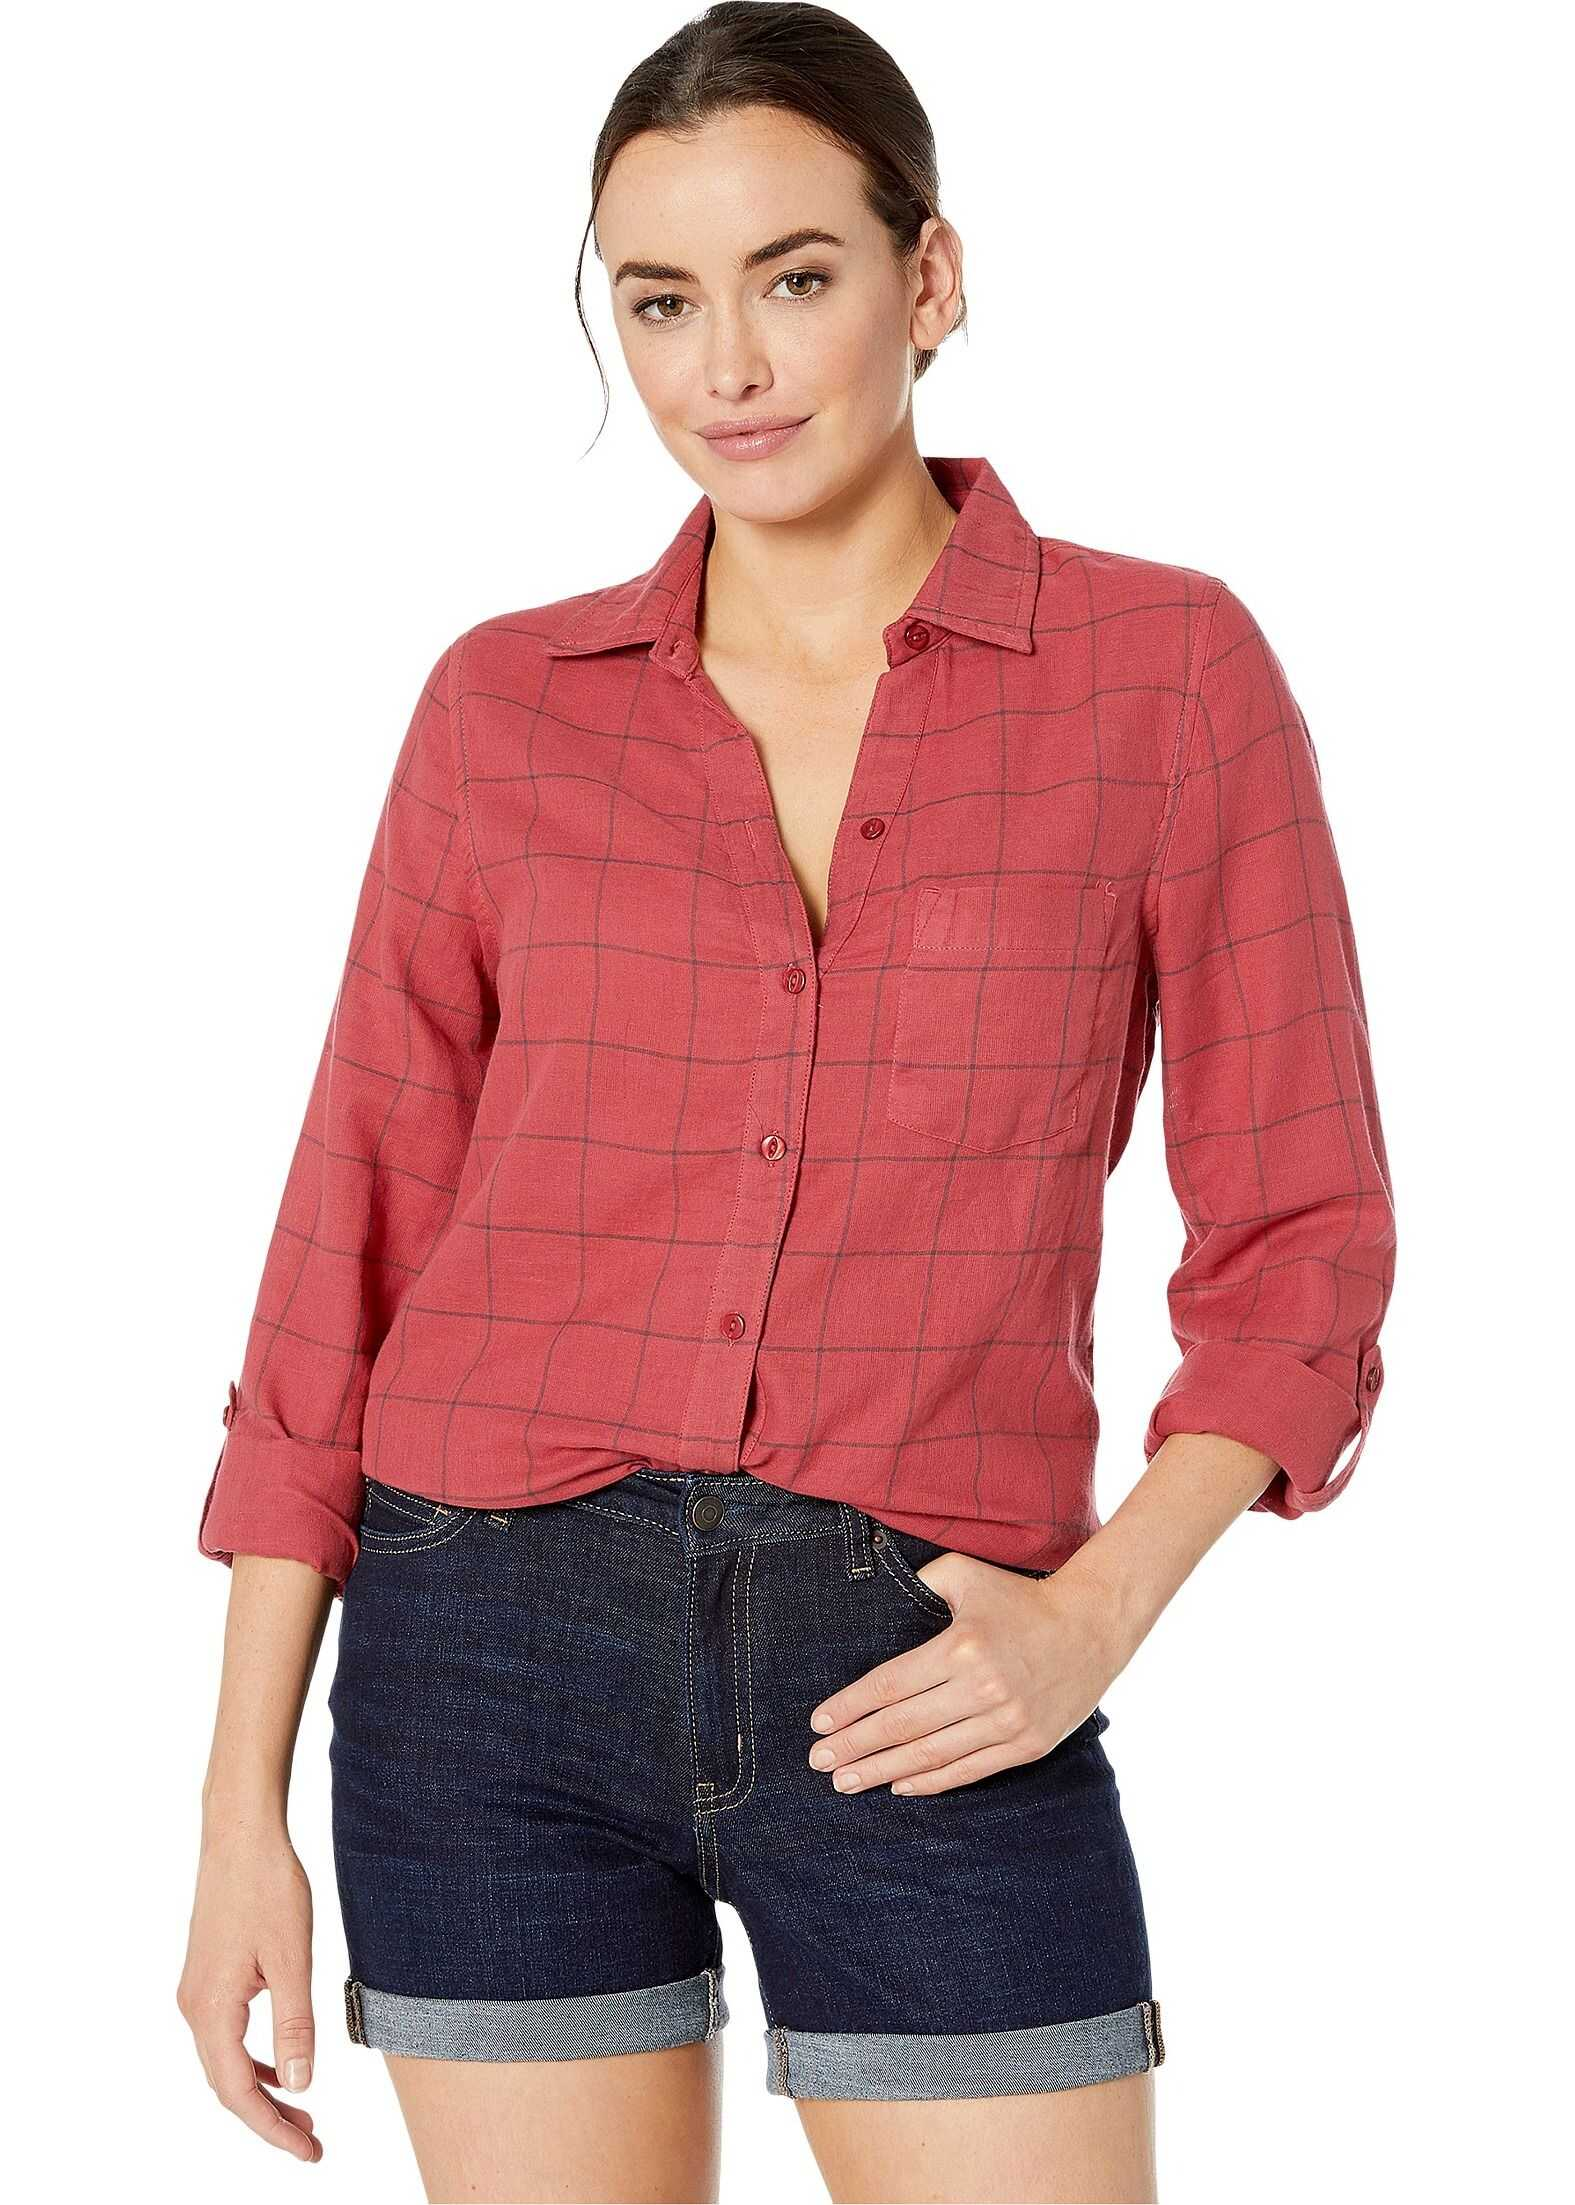 Jag Jeans Long Sleeve Adley Double Cloth Button Up Shirt Tibetan Plaid